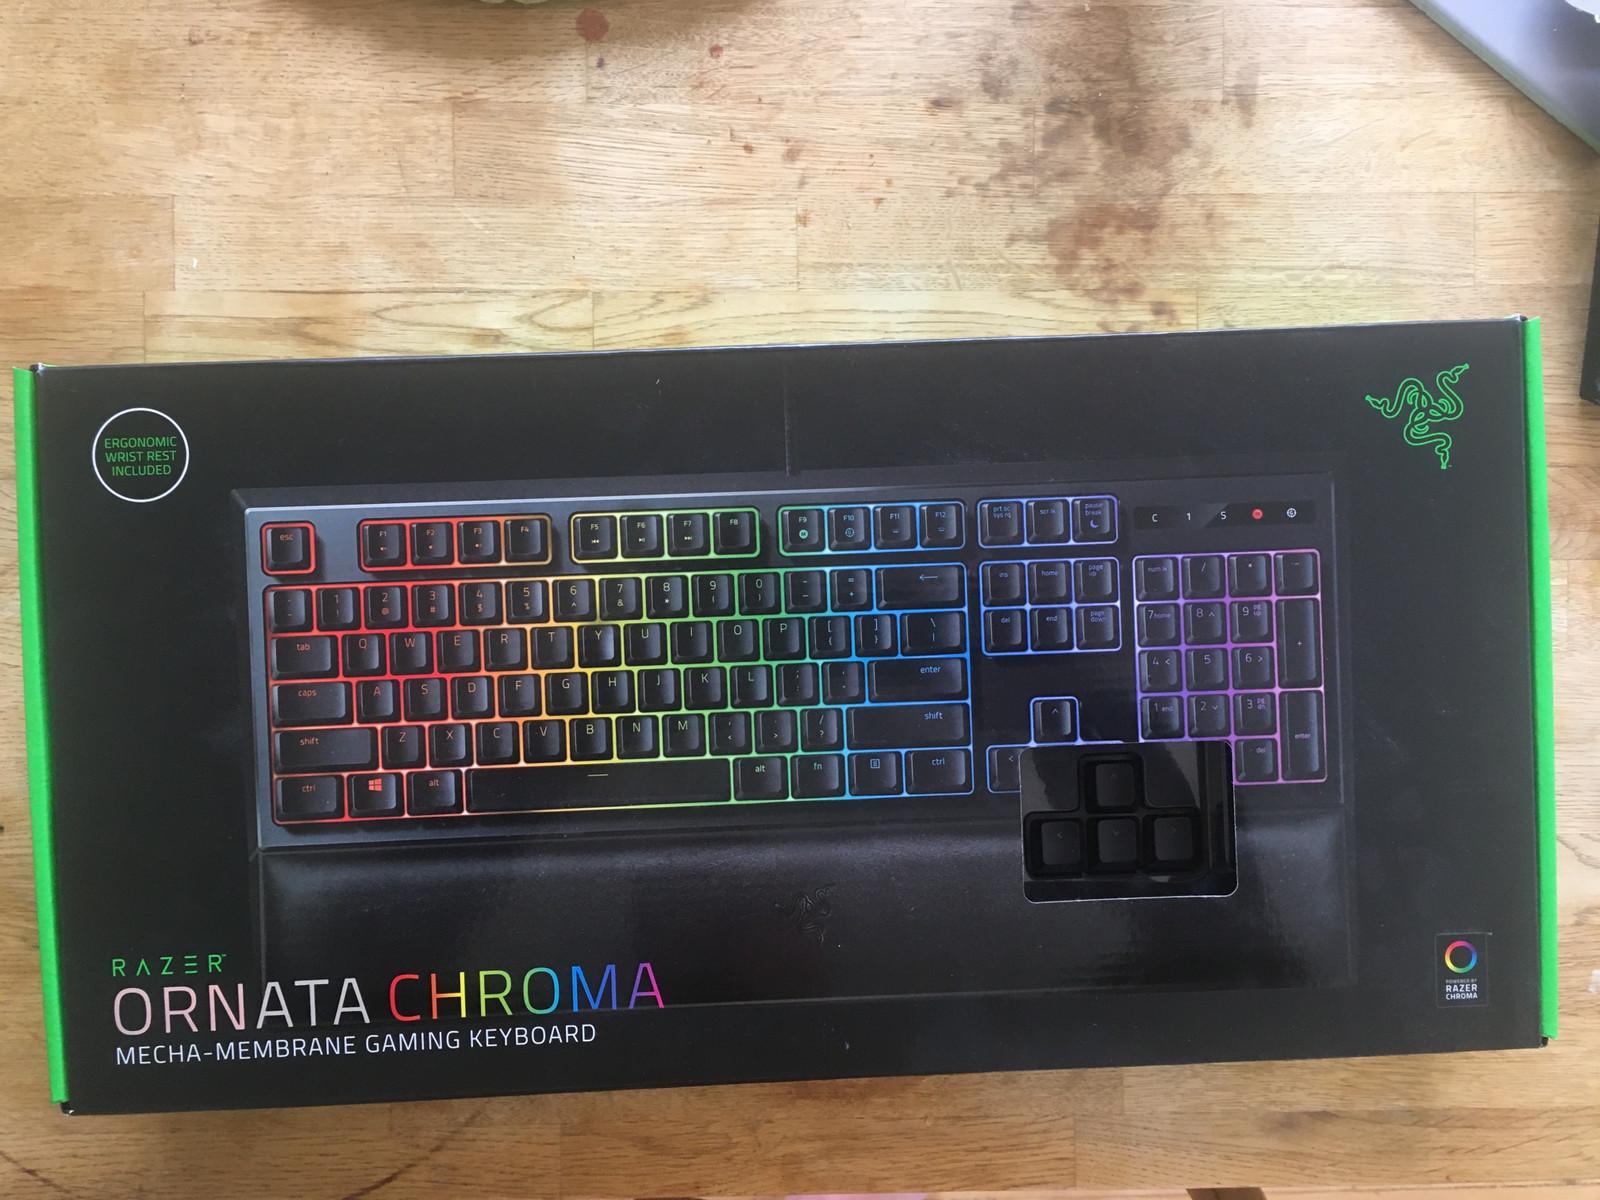 Razer ornata chroma gaming keyboard   FINN.no